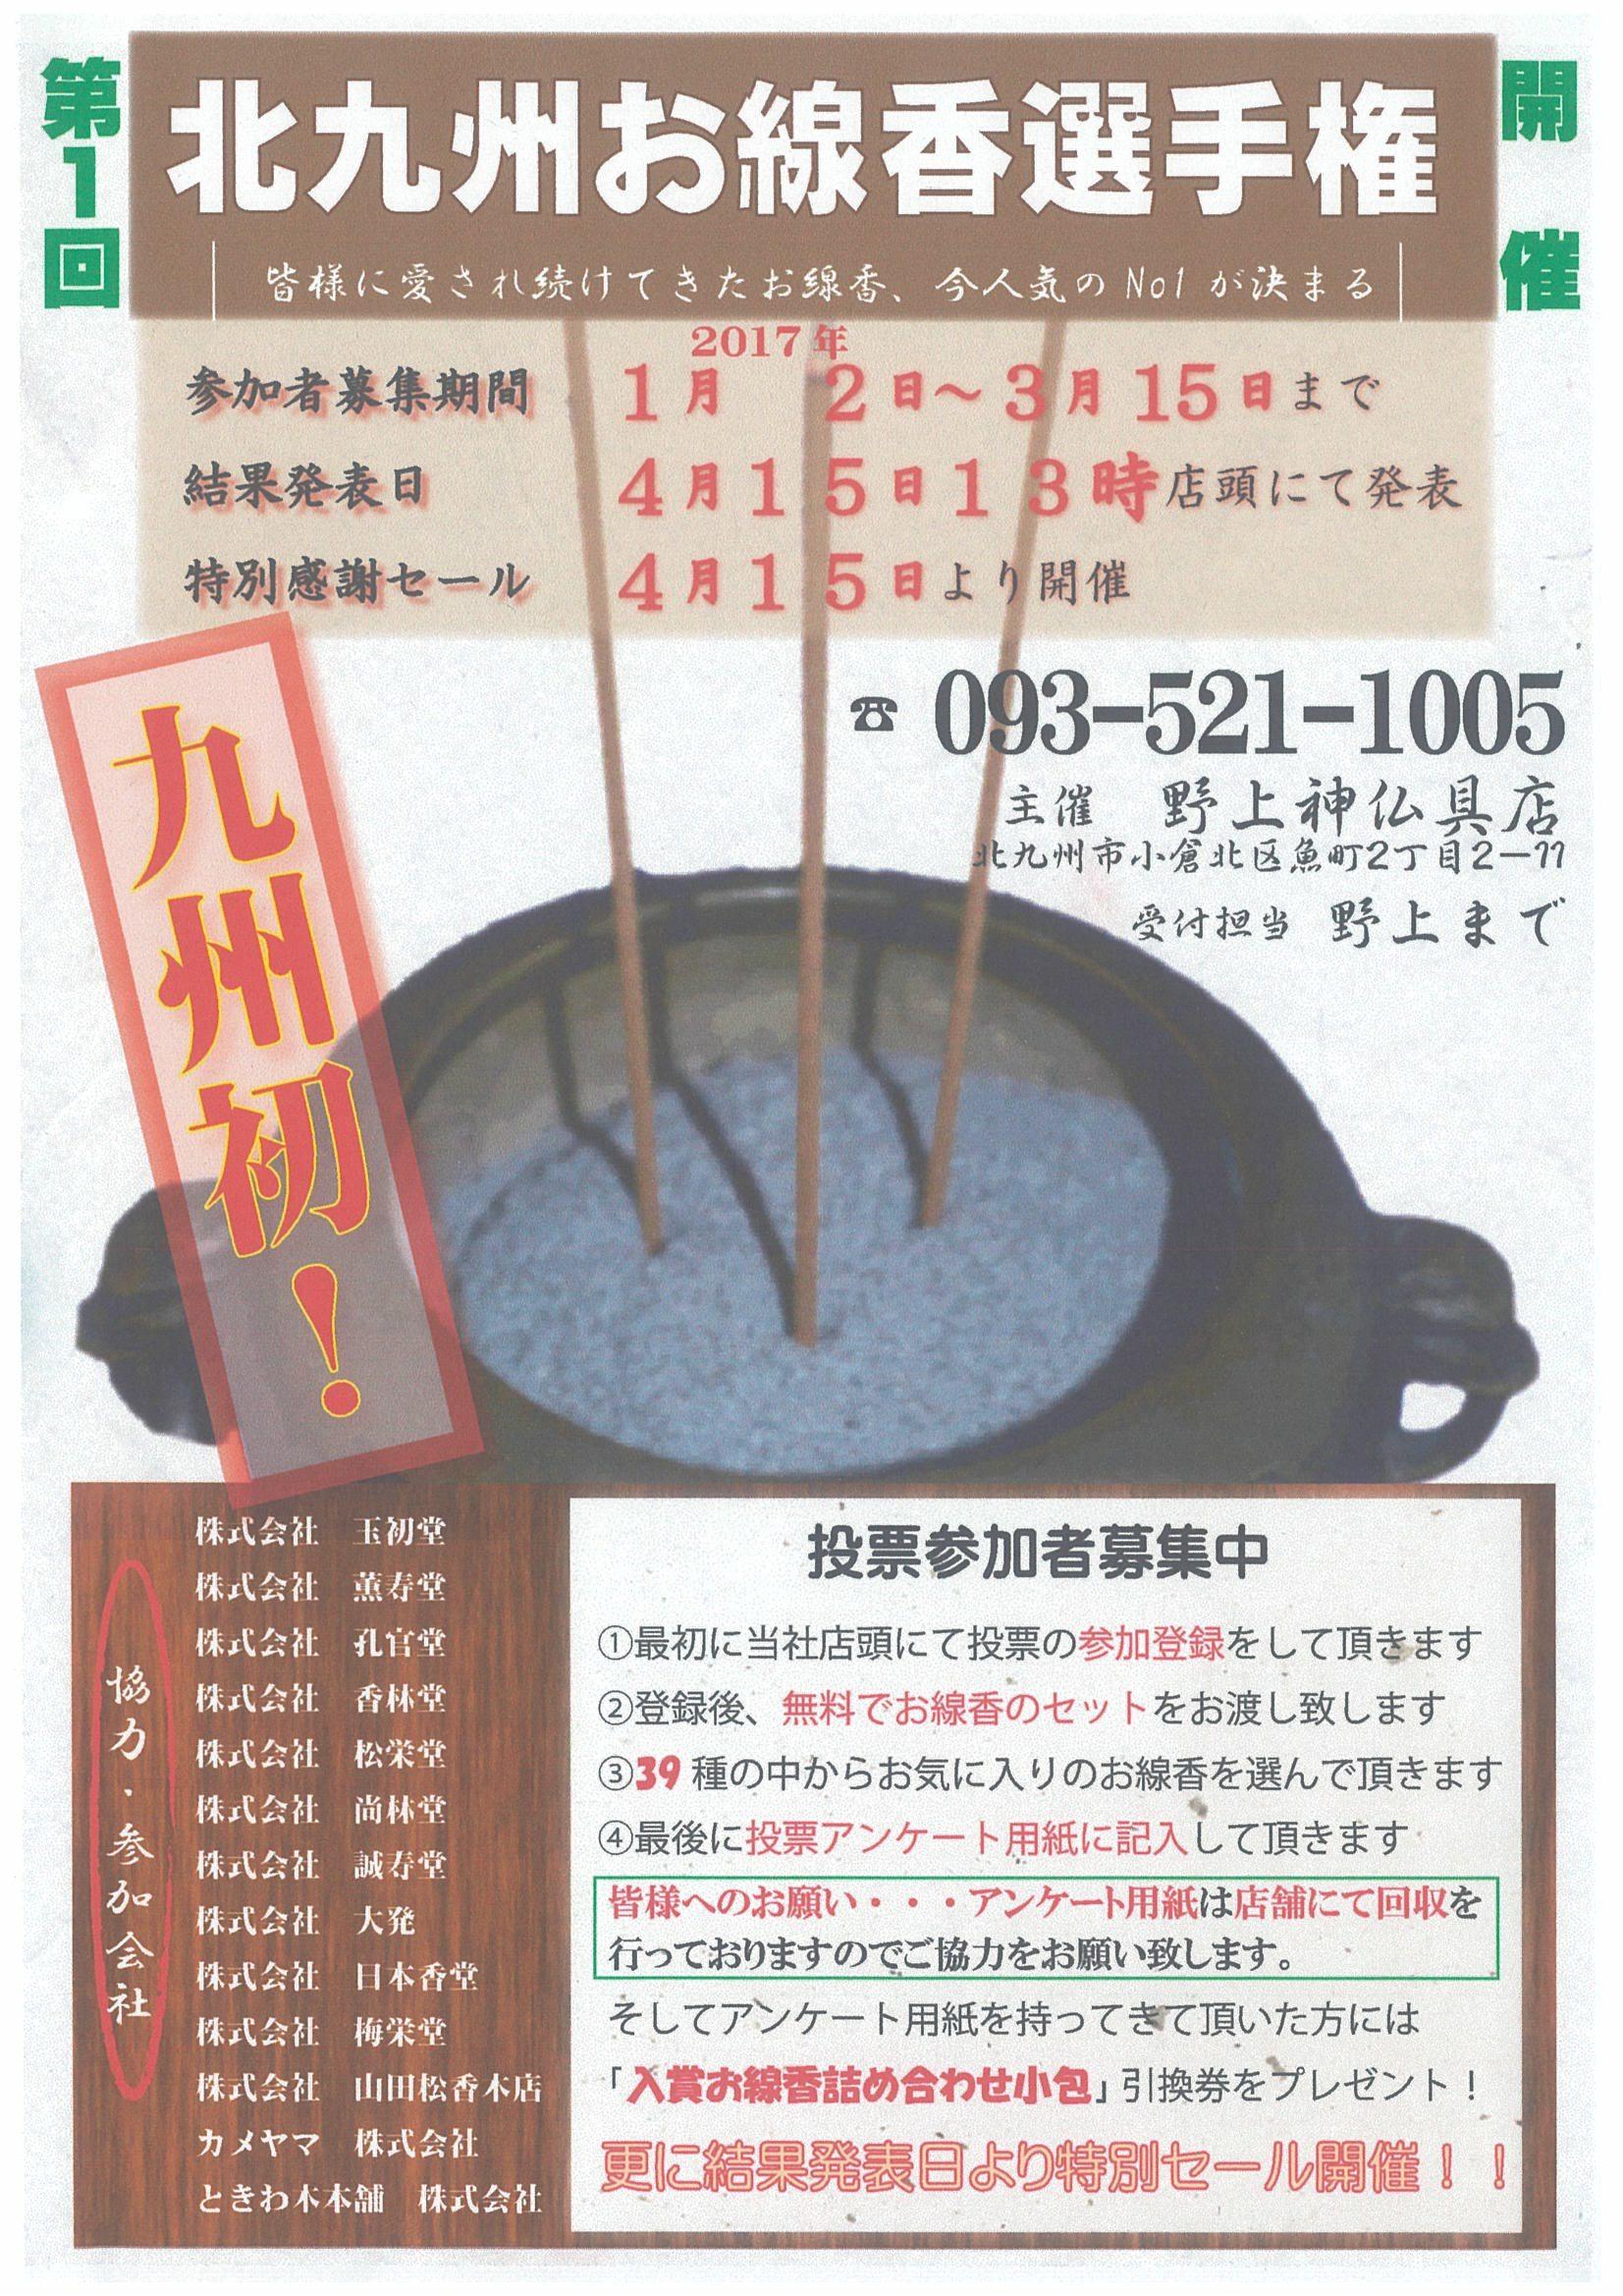 第1回北九州お線香選手権